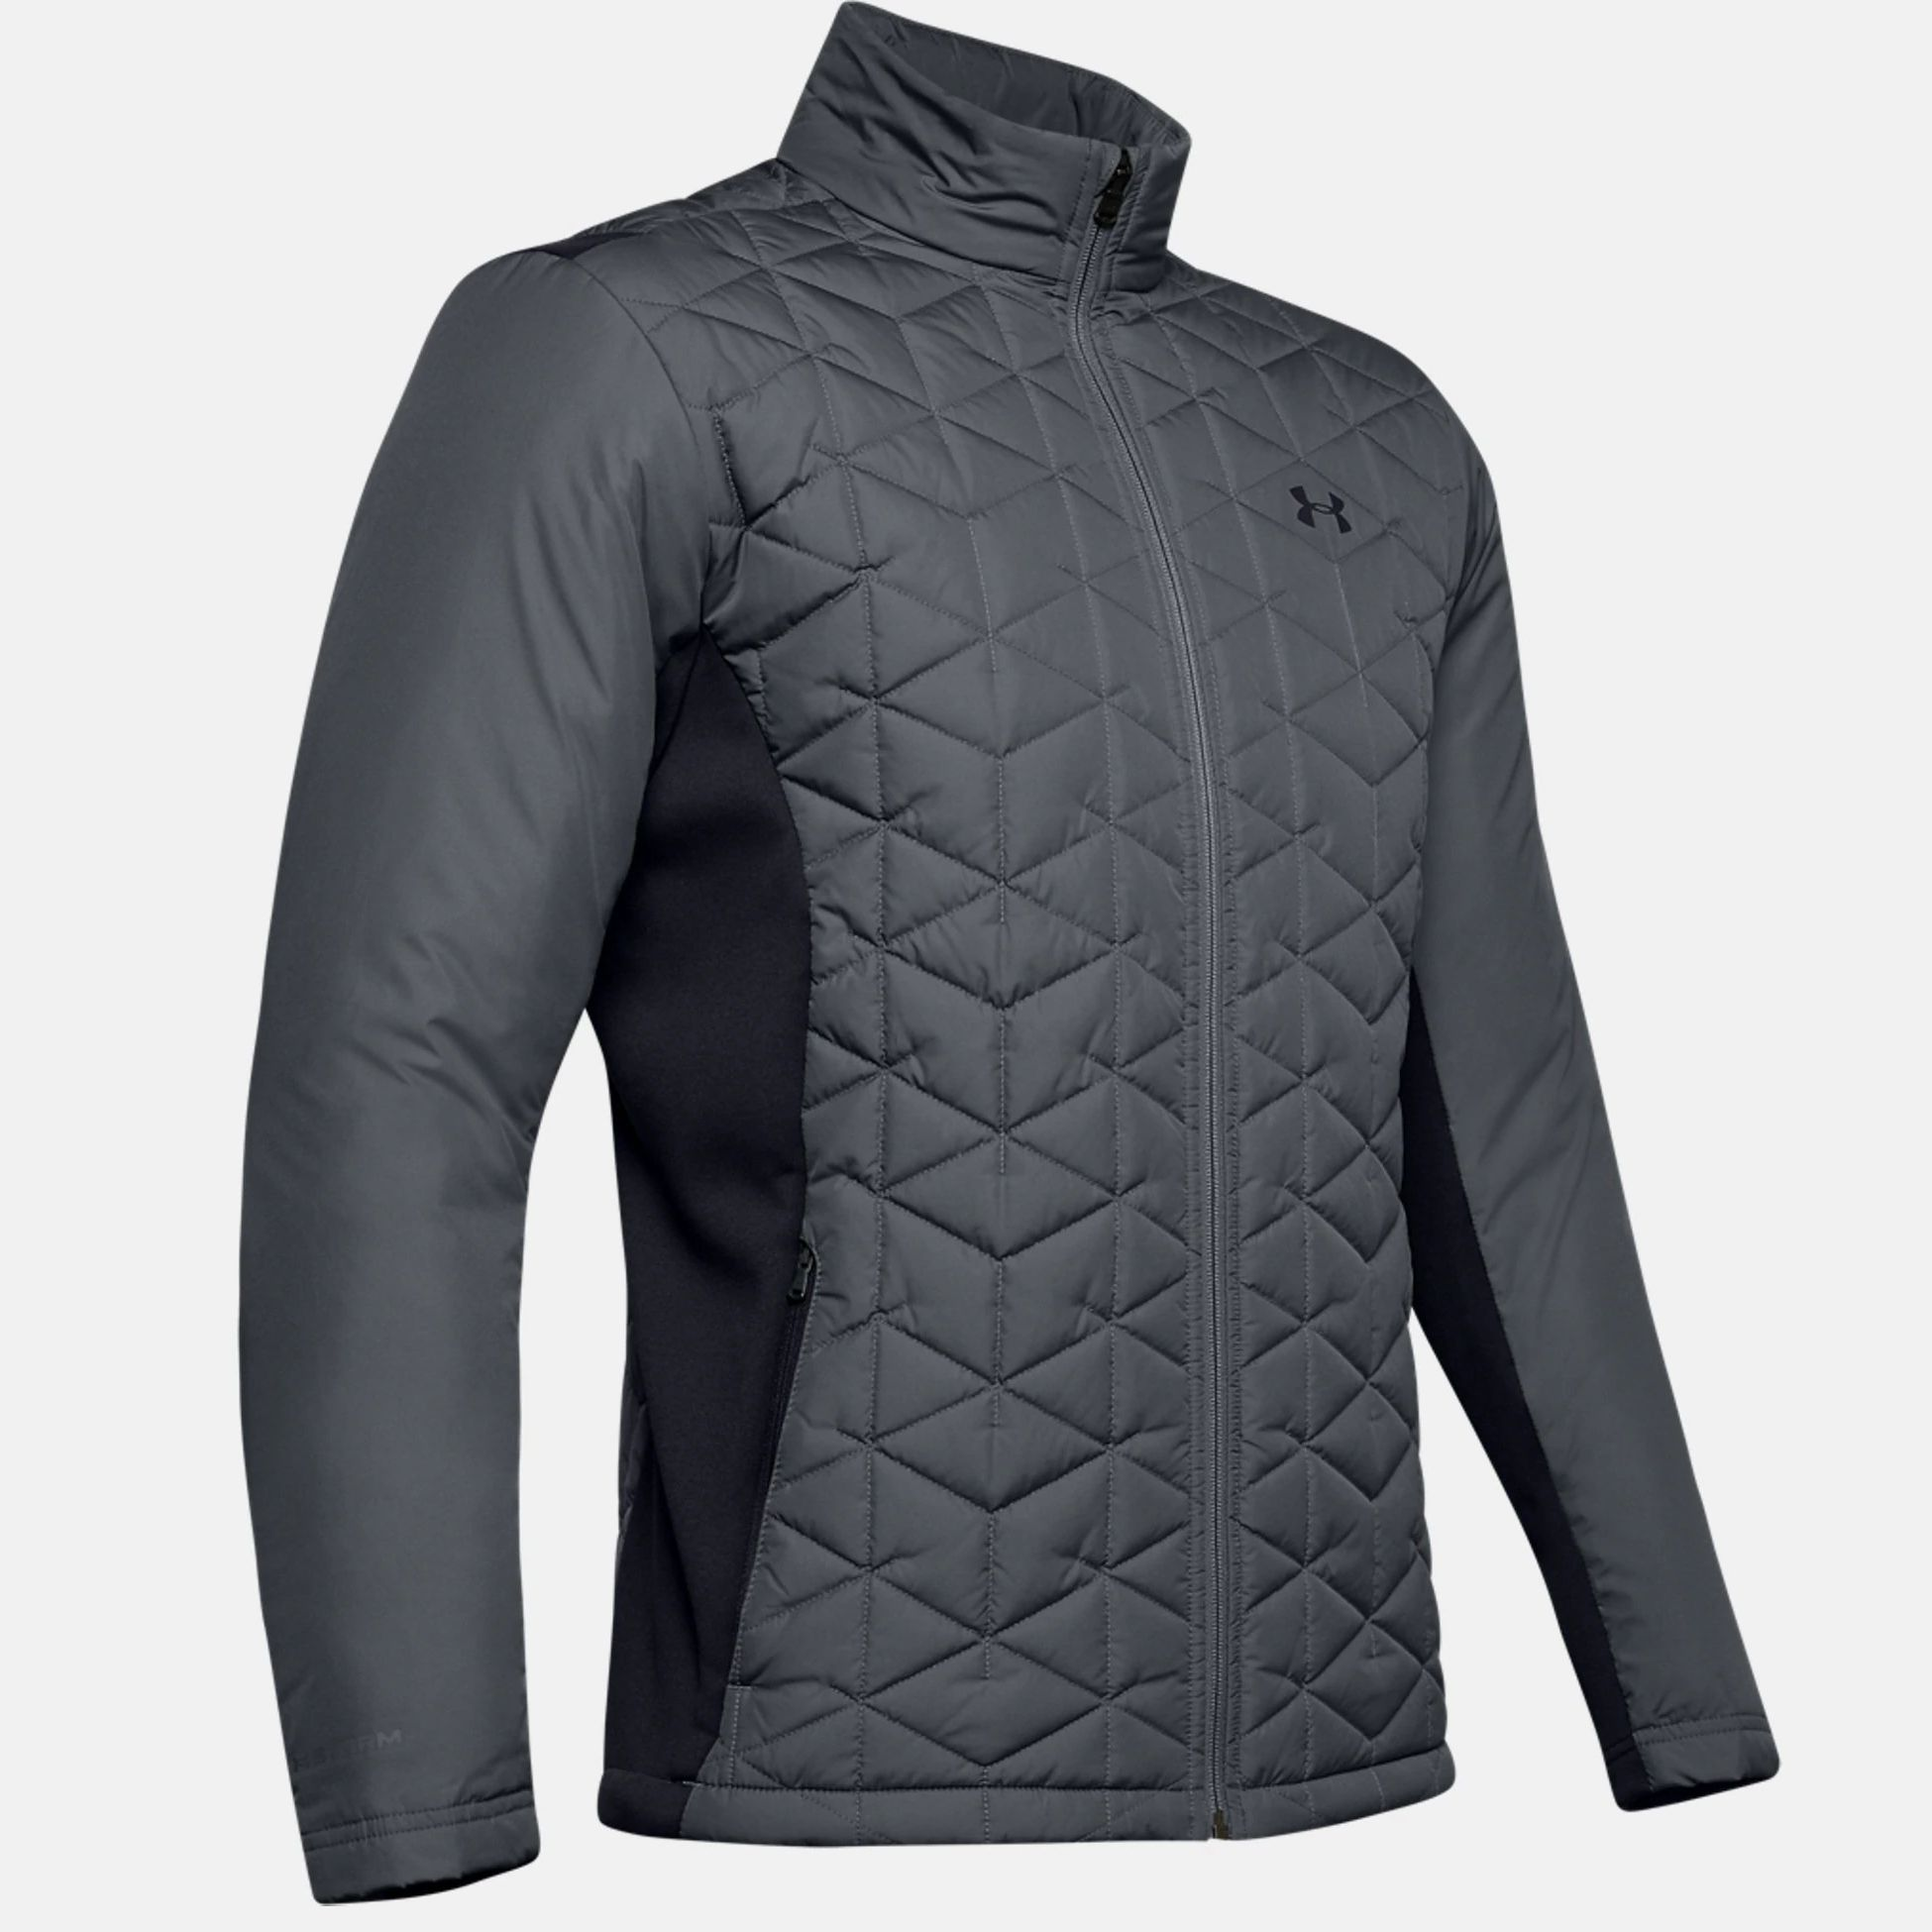 Clothing -  under armour ColdGear Reactor Golf Hybrid Jacket 9982